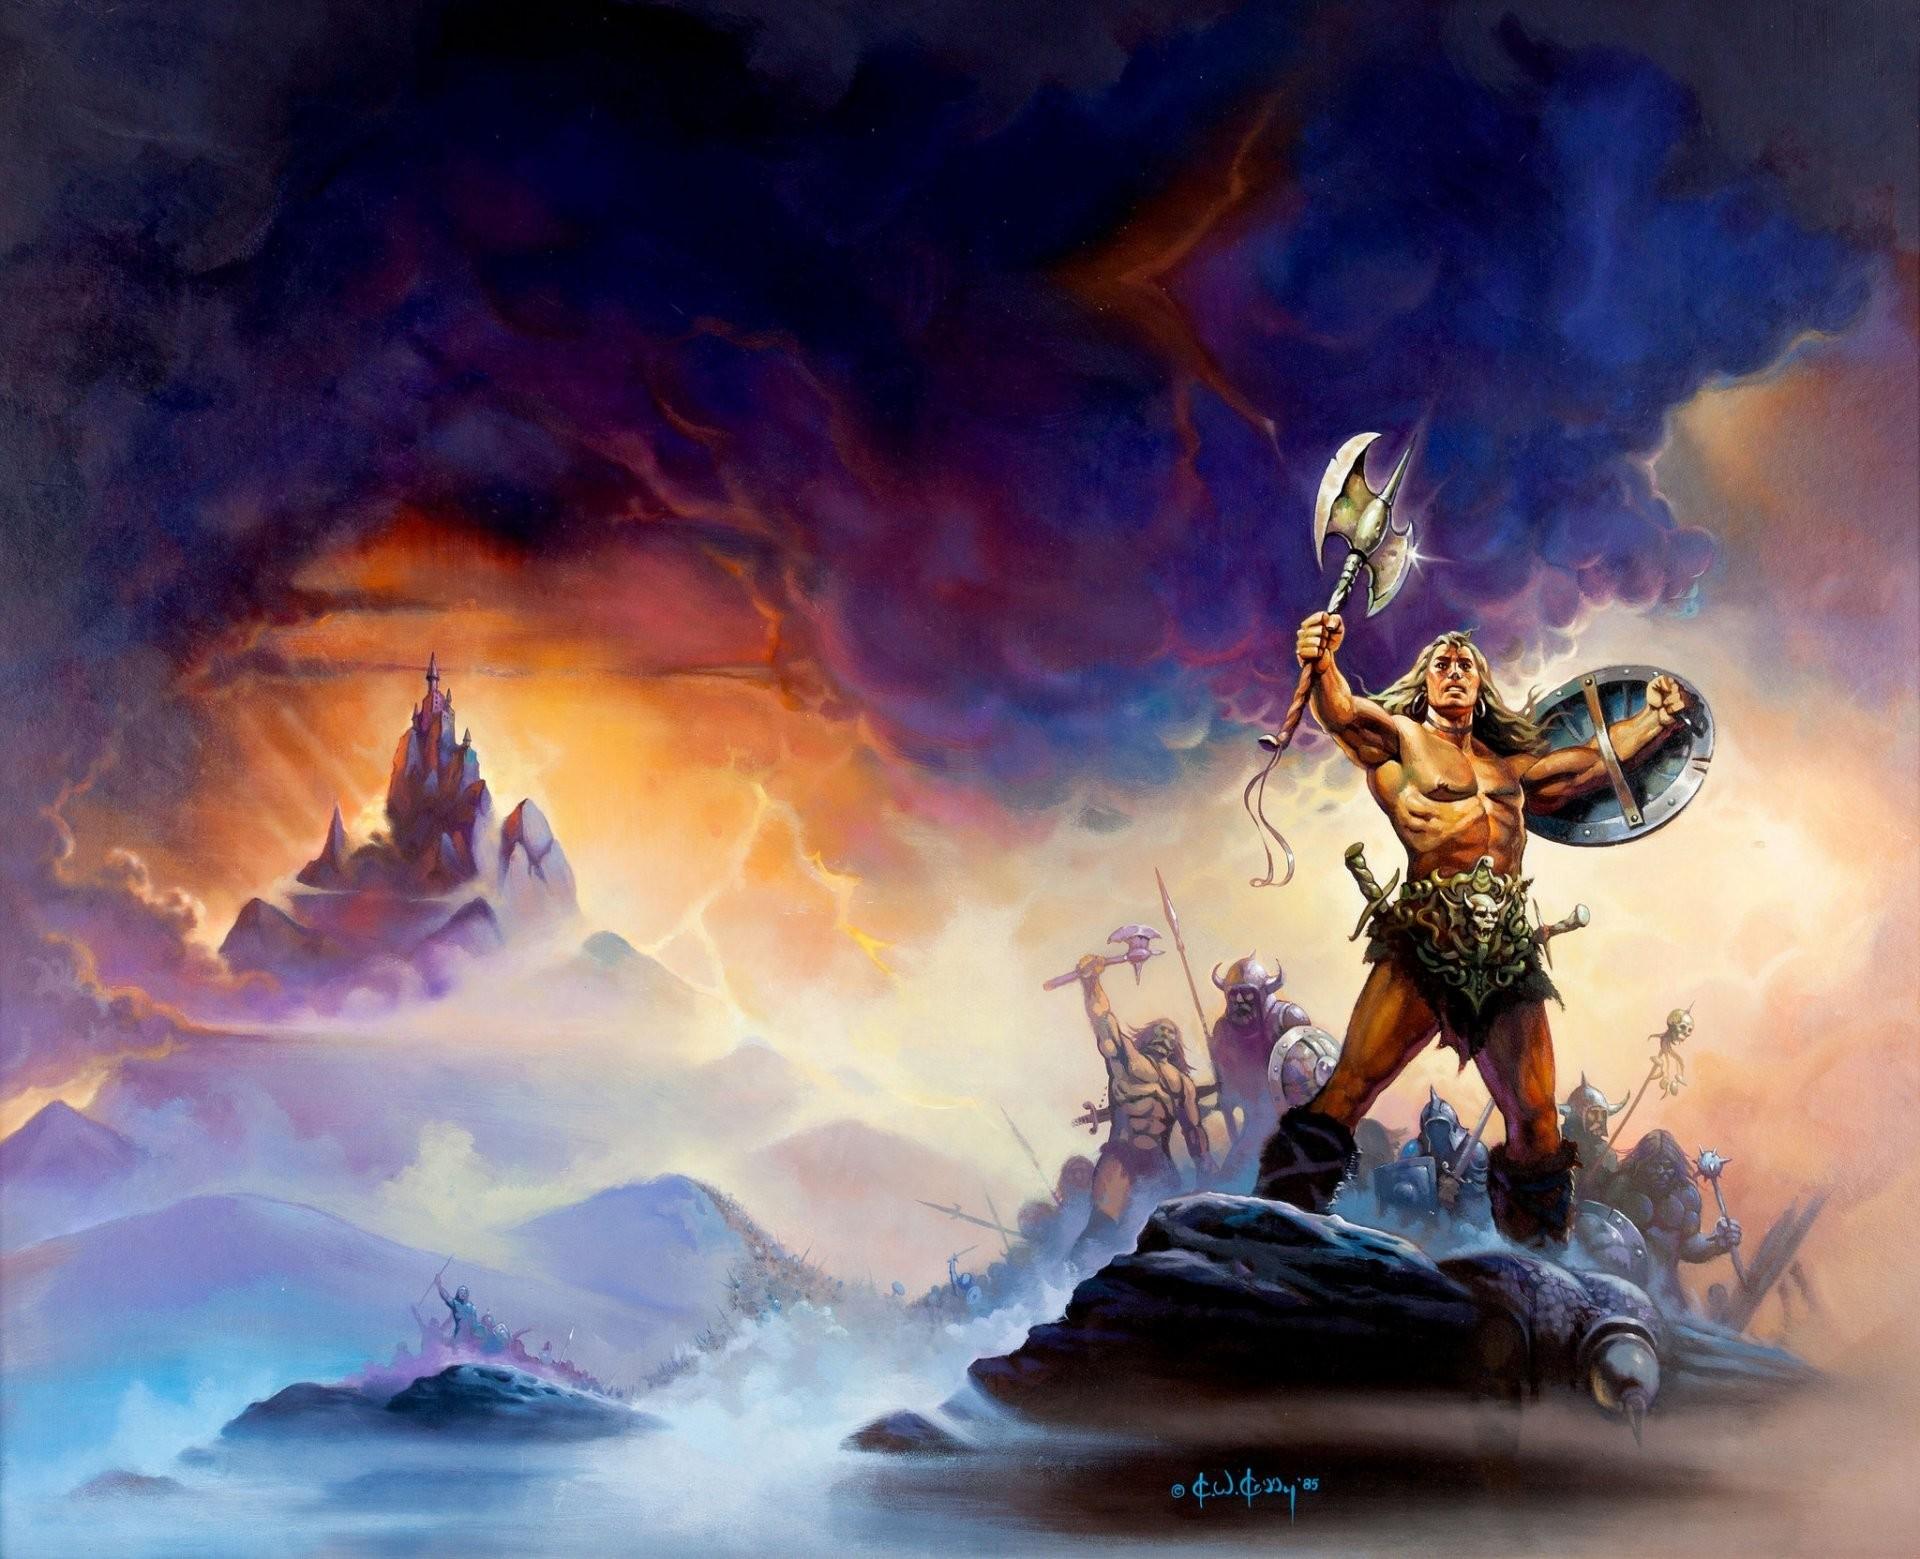 Conan the Barbarian Wallpaper (75+ images)